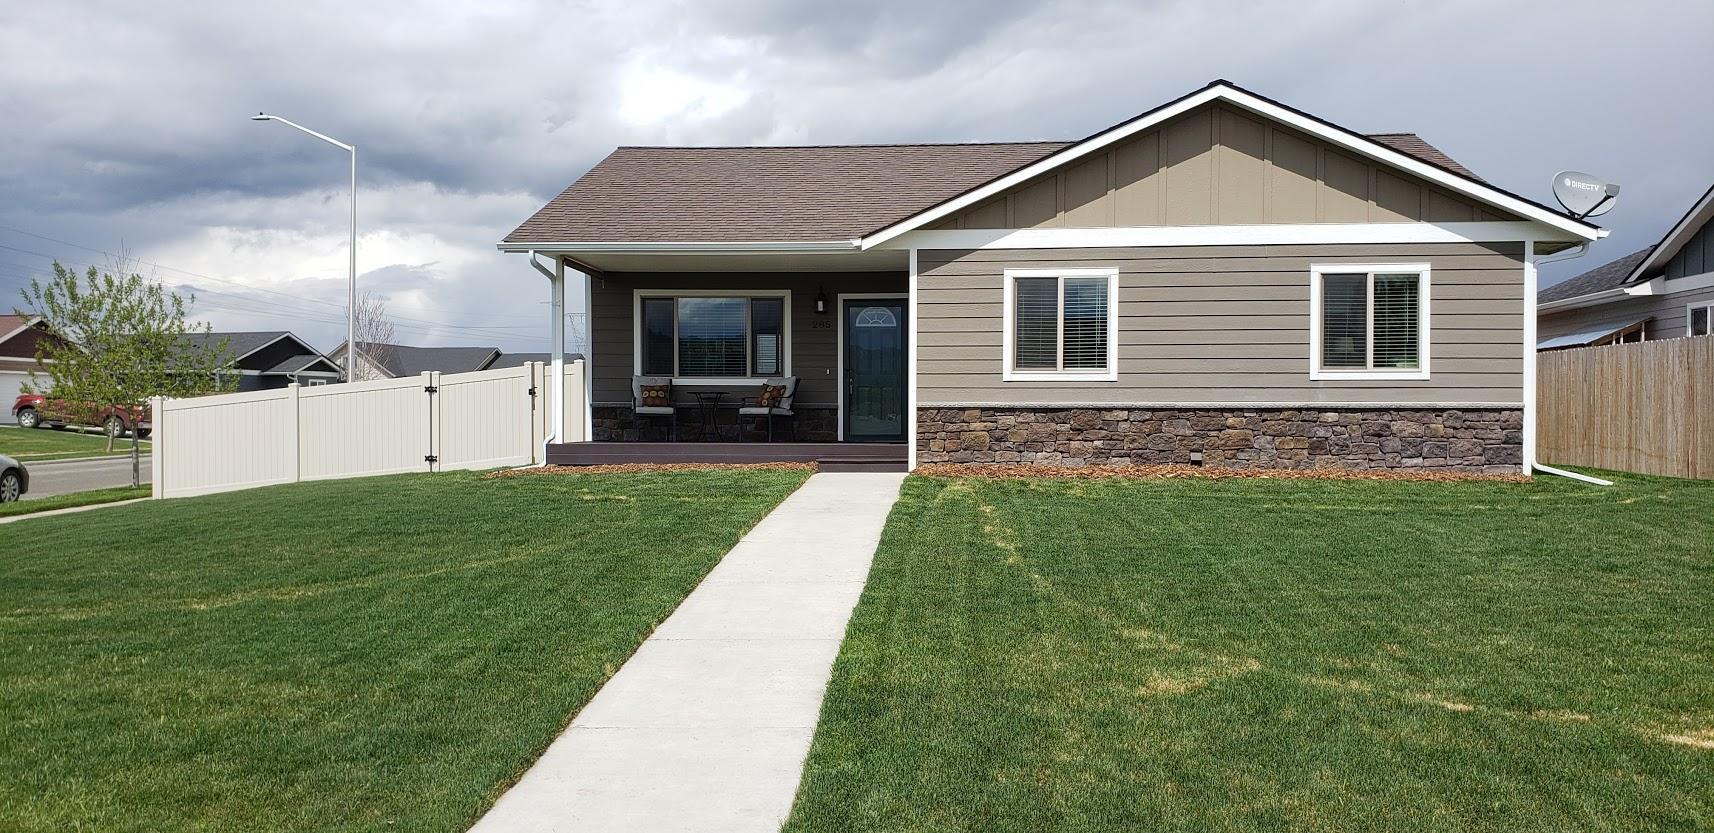 285 Short Pine Drive, Kalispell, MT 59901